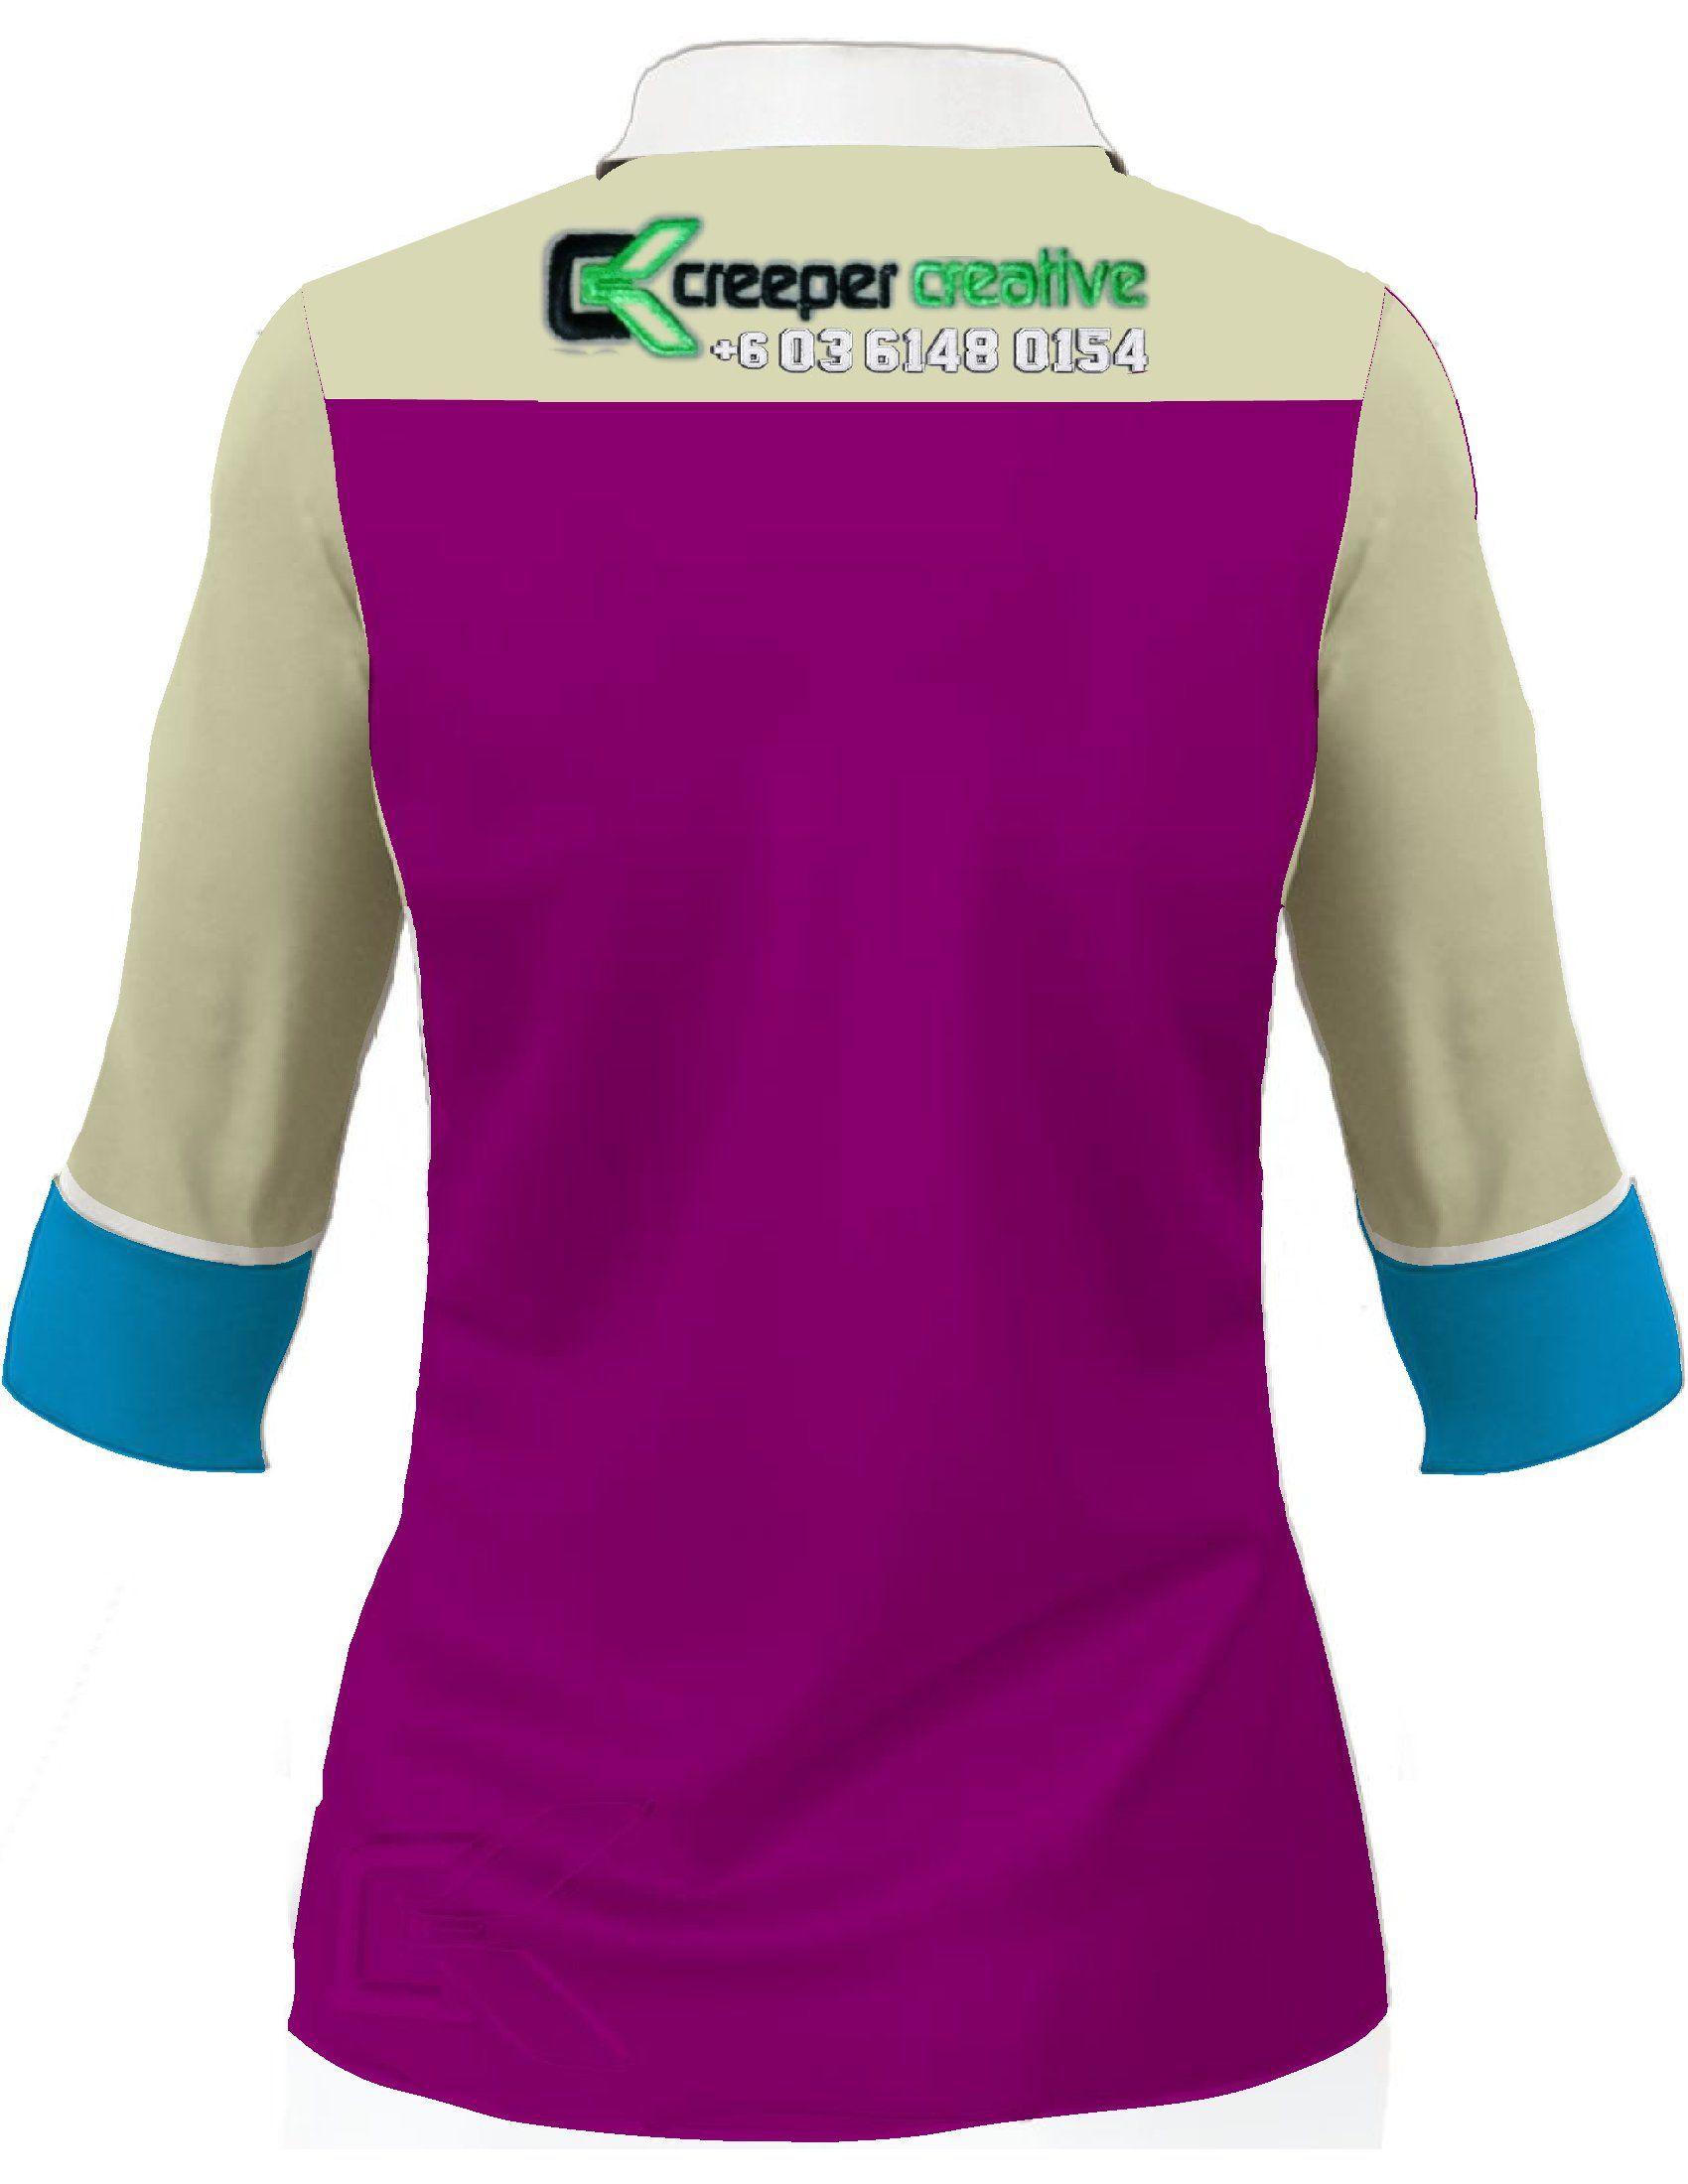 Baju korporat wanita labuh design baju korporat muslimah